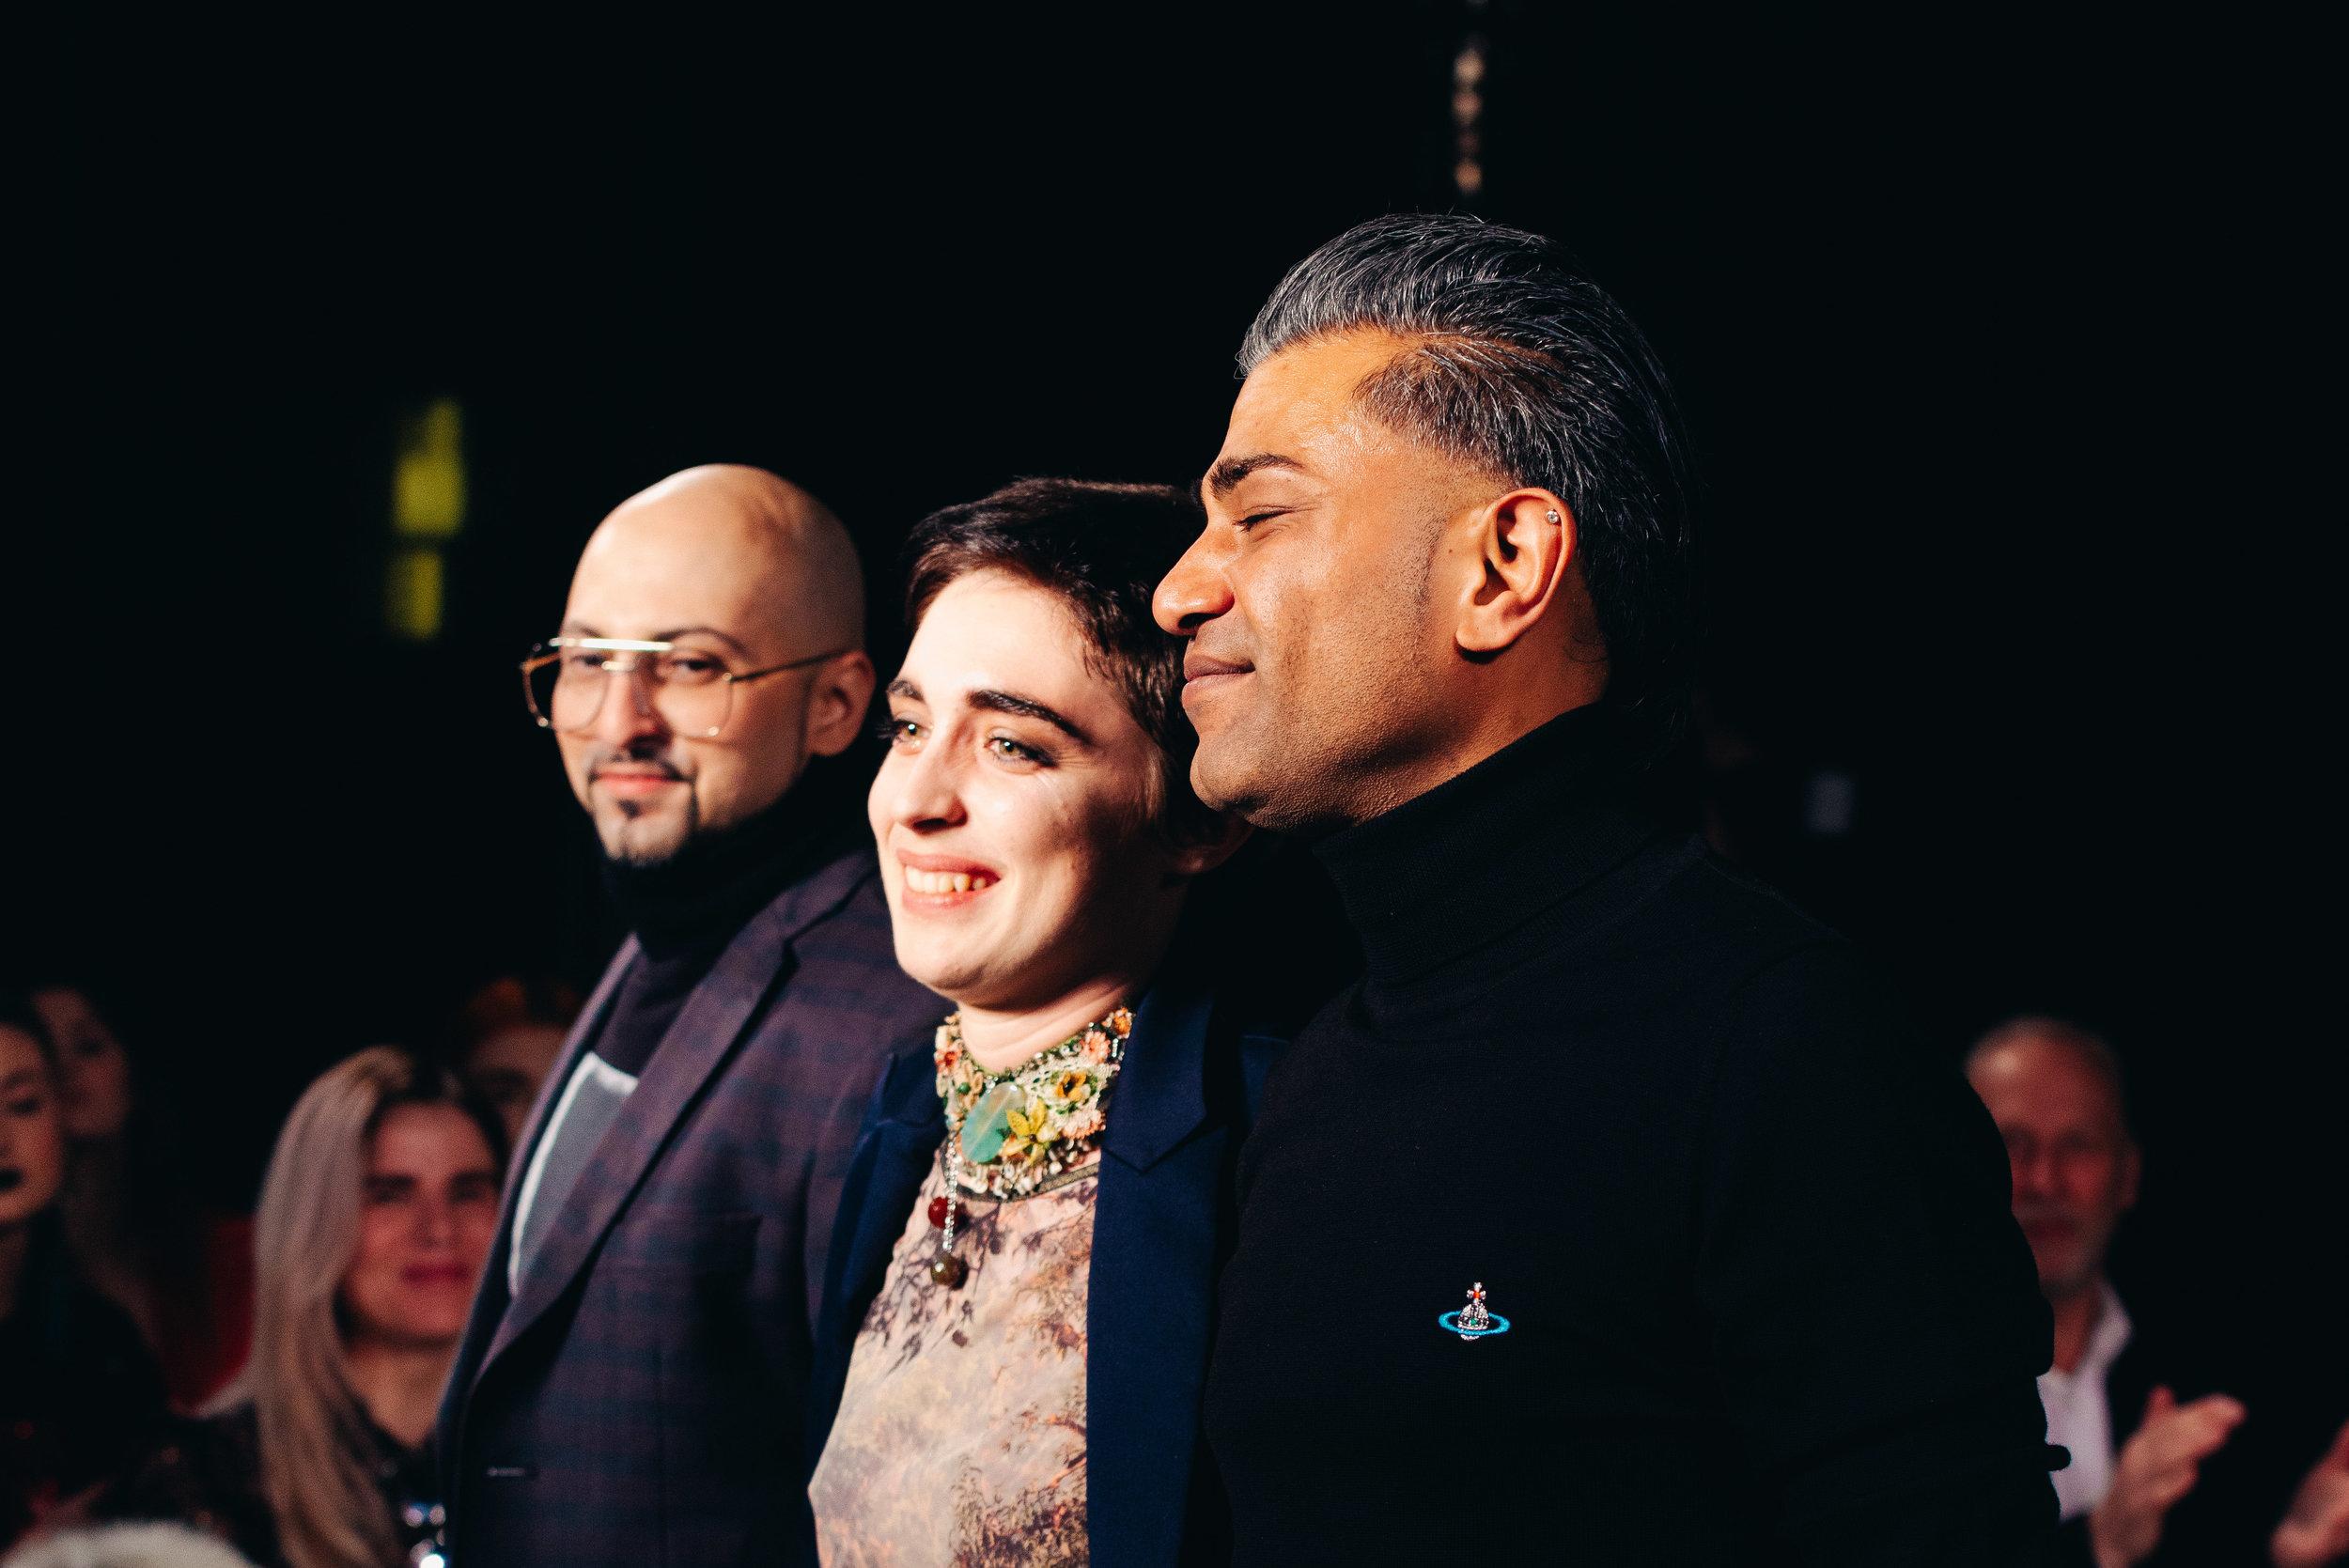 Left: Rene Garza | Middle: Ava J. Holmes | Right: Jatin Patel